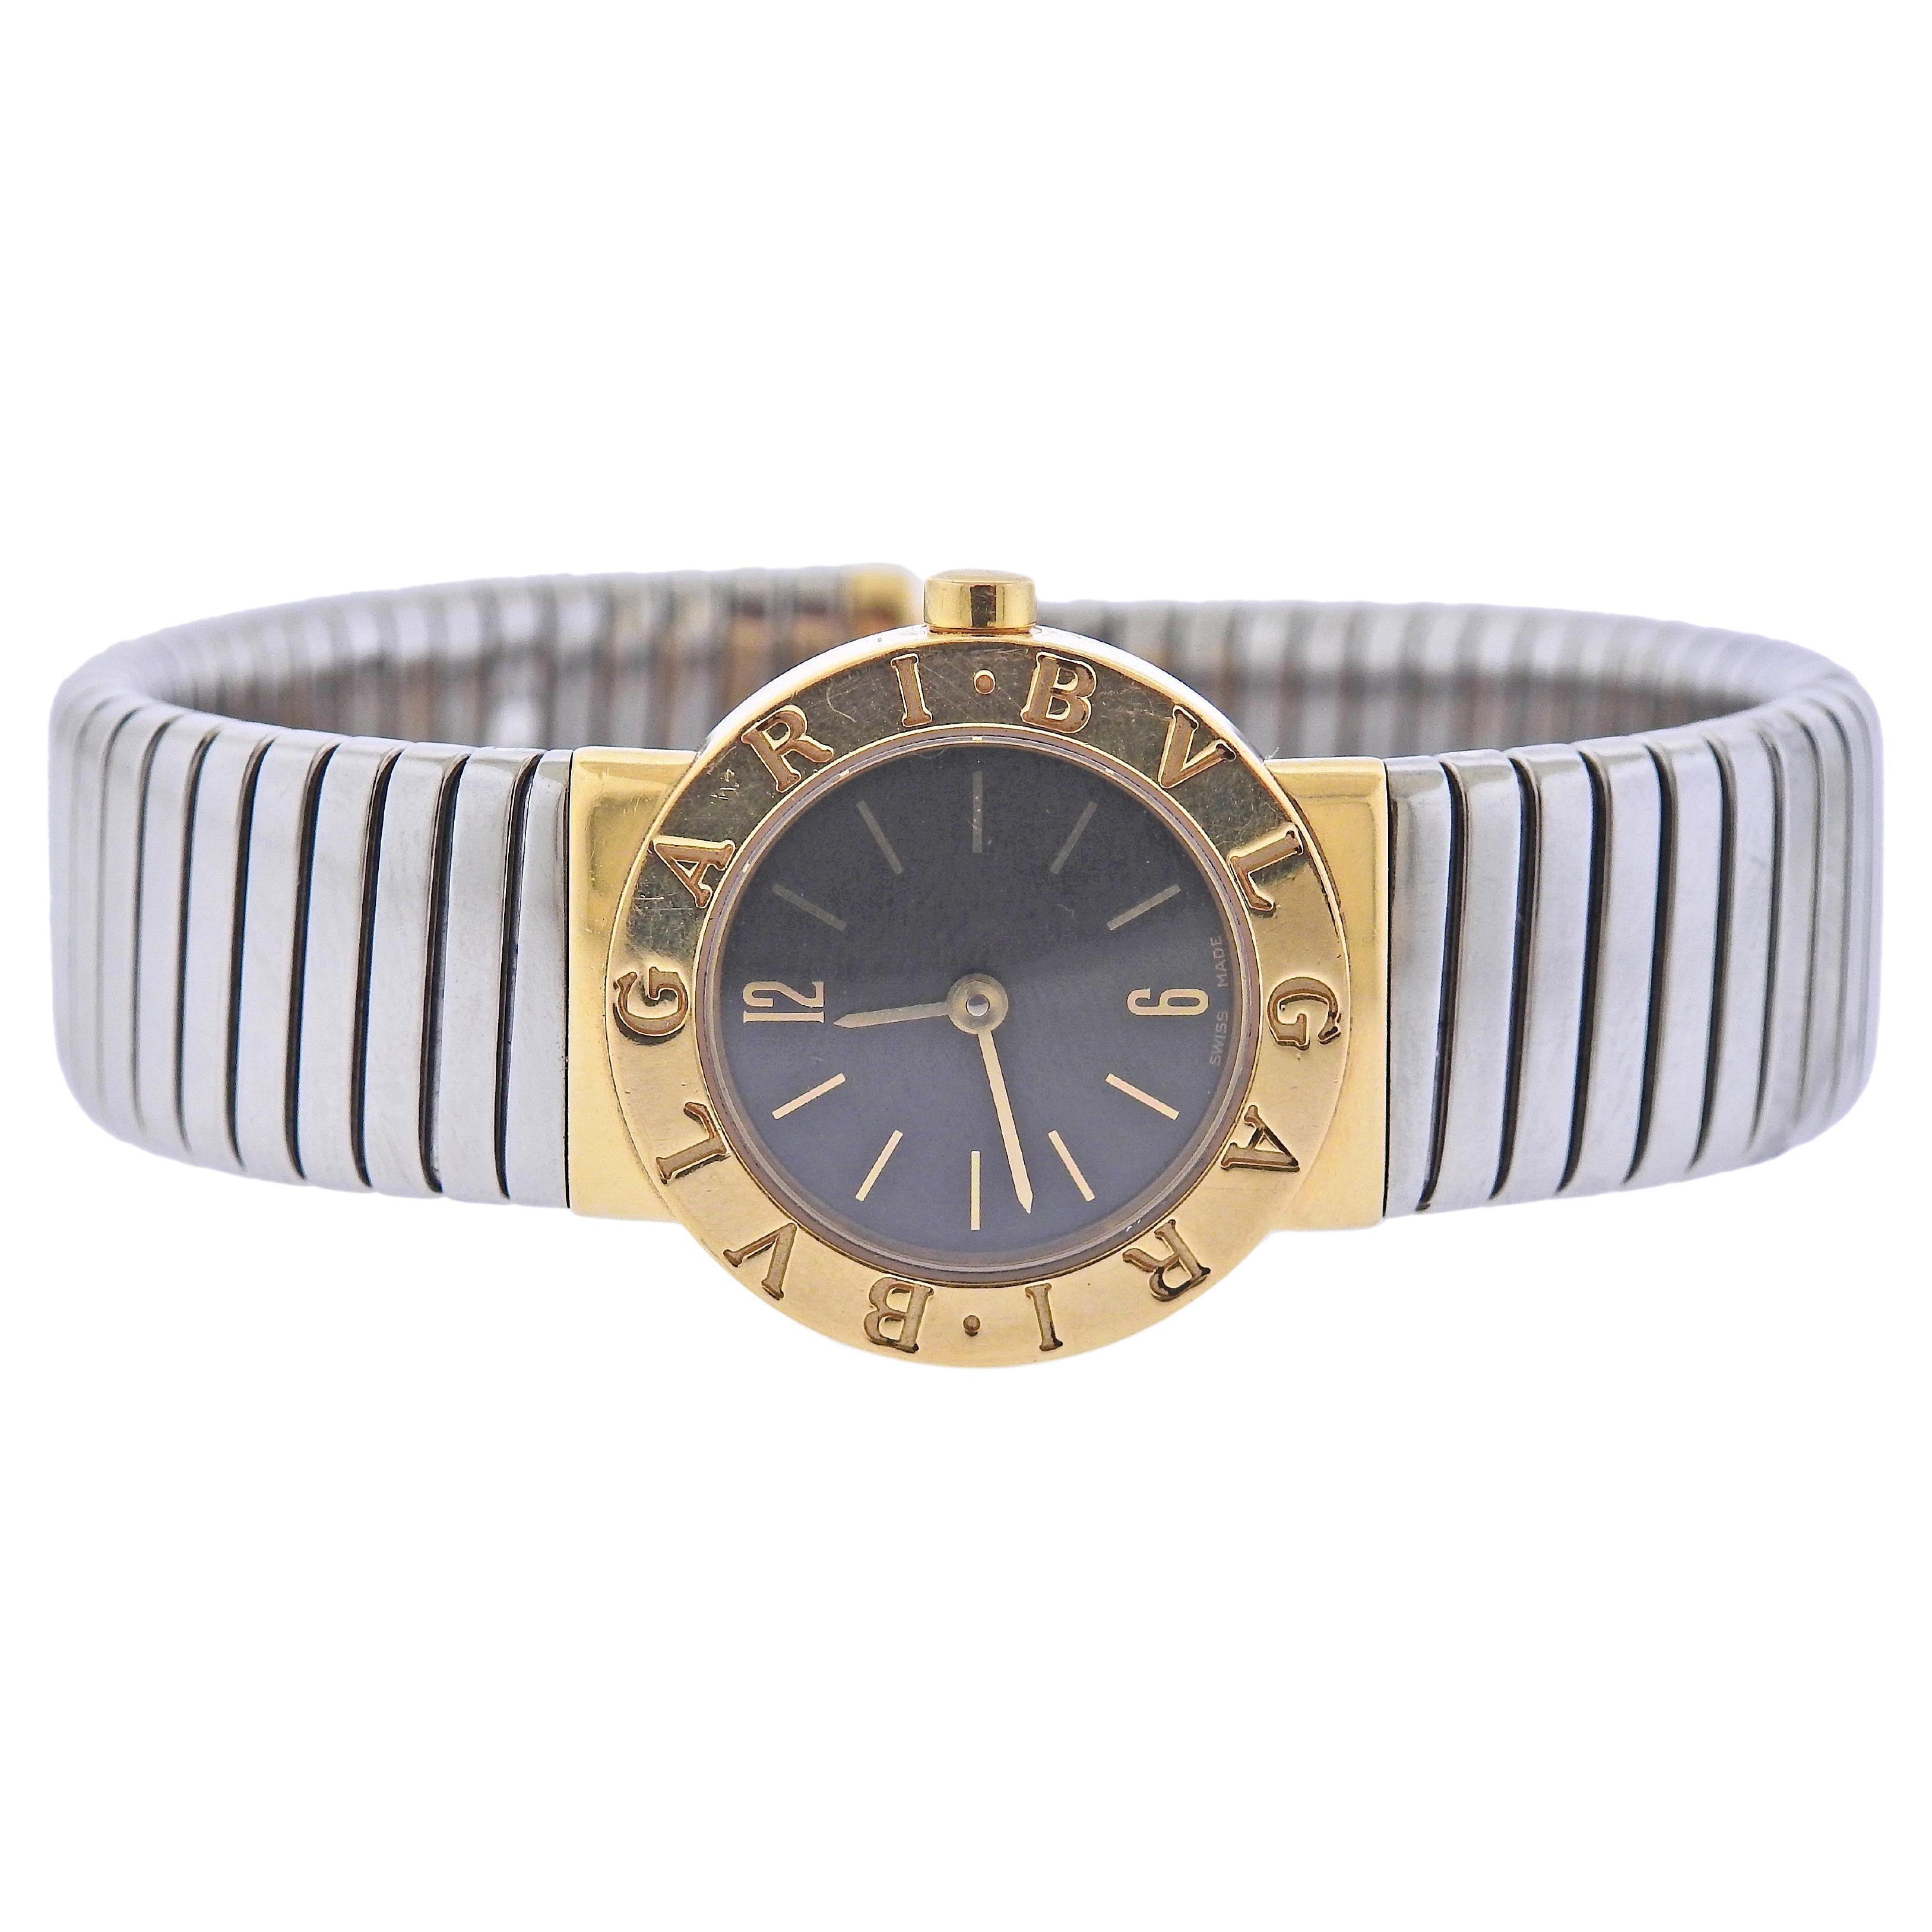 Bulgari Tubogas Gold and Steel Watch Bracelet BB232T